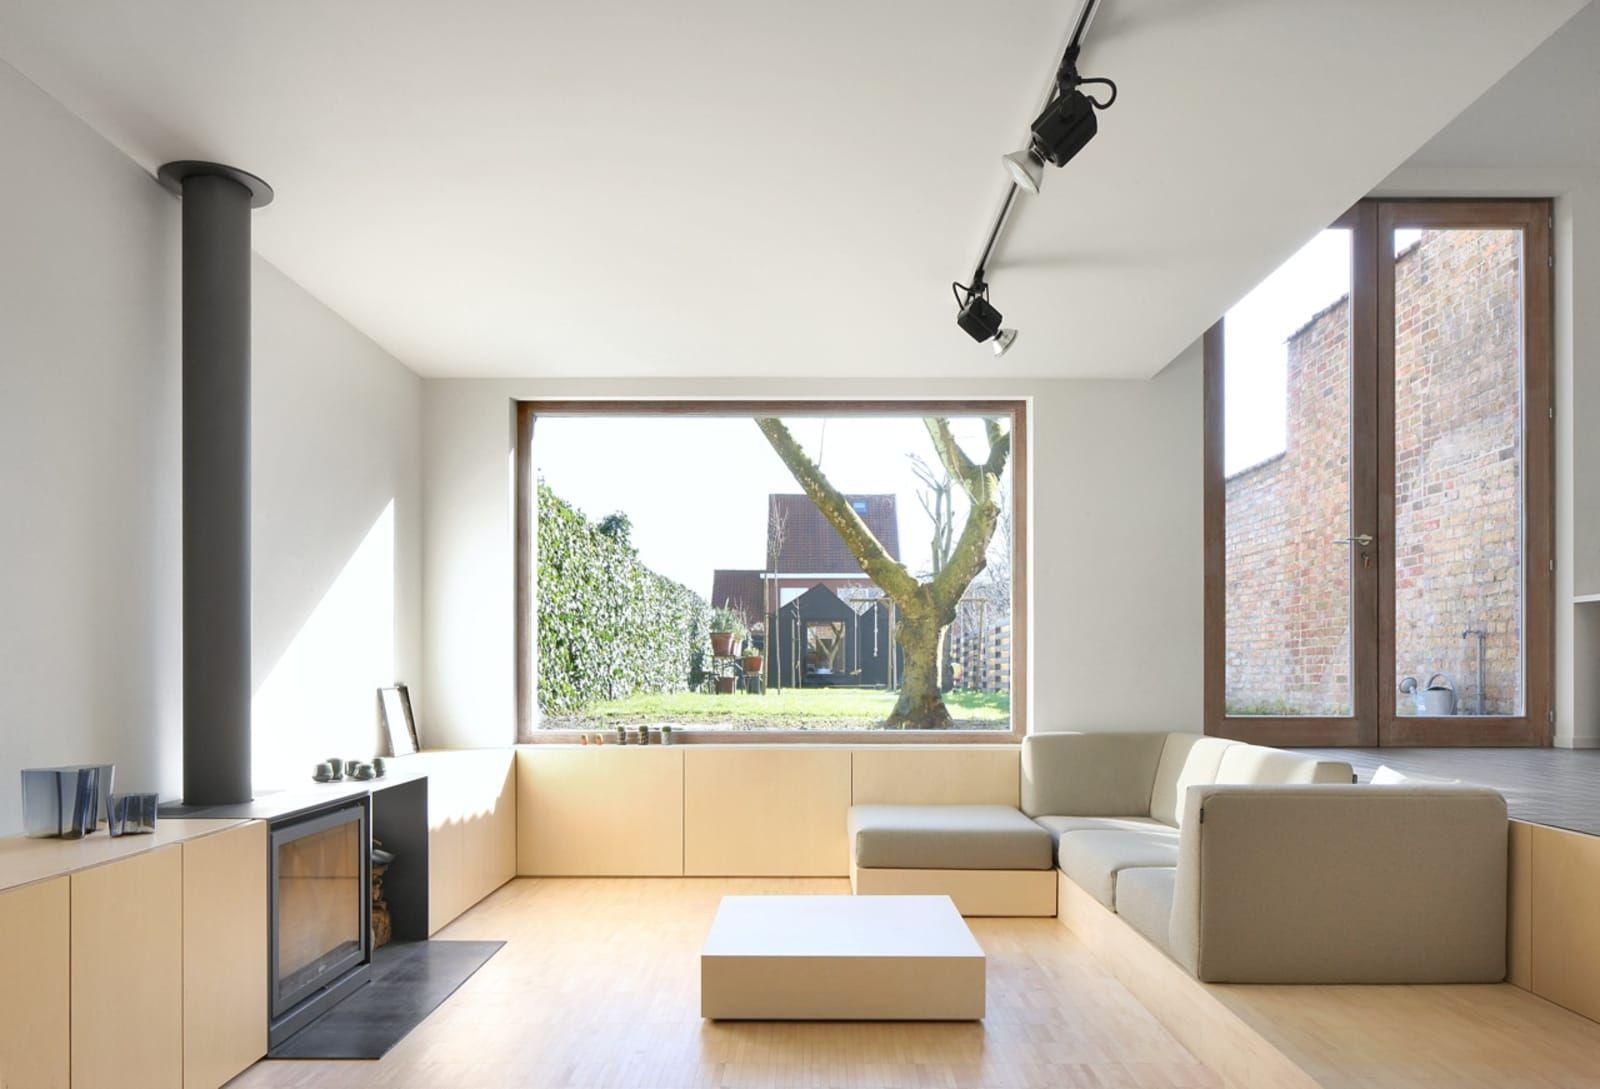 urbain architectencollectief filip dujardin reconversion of a modernistic house elements. Black Bedroom Furniture Sets. Home Design Ideas